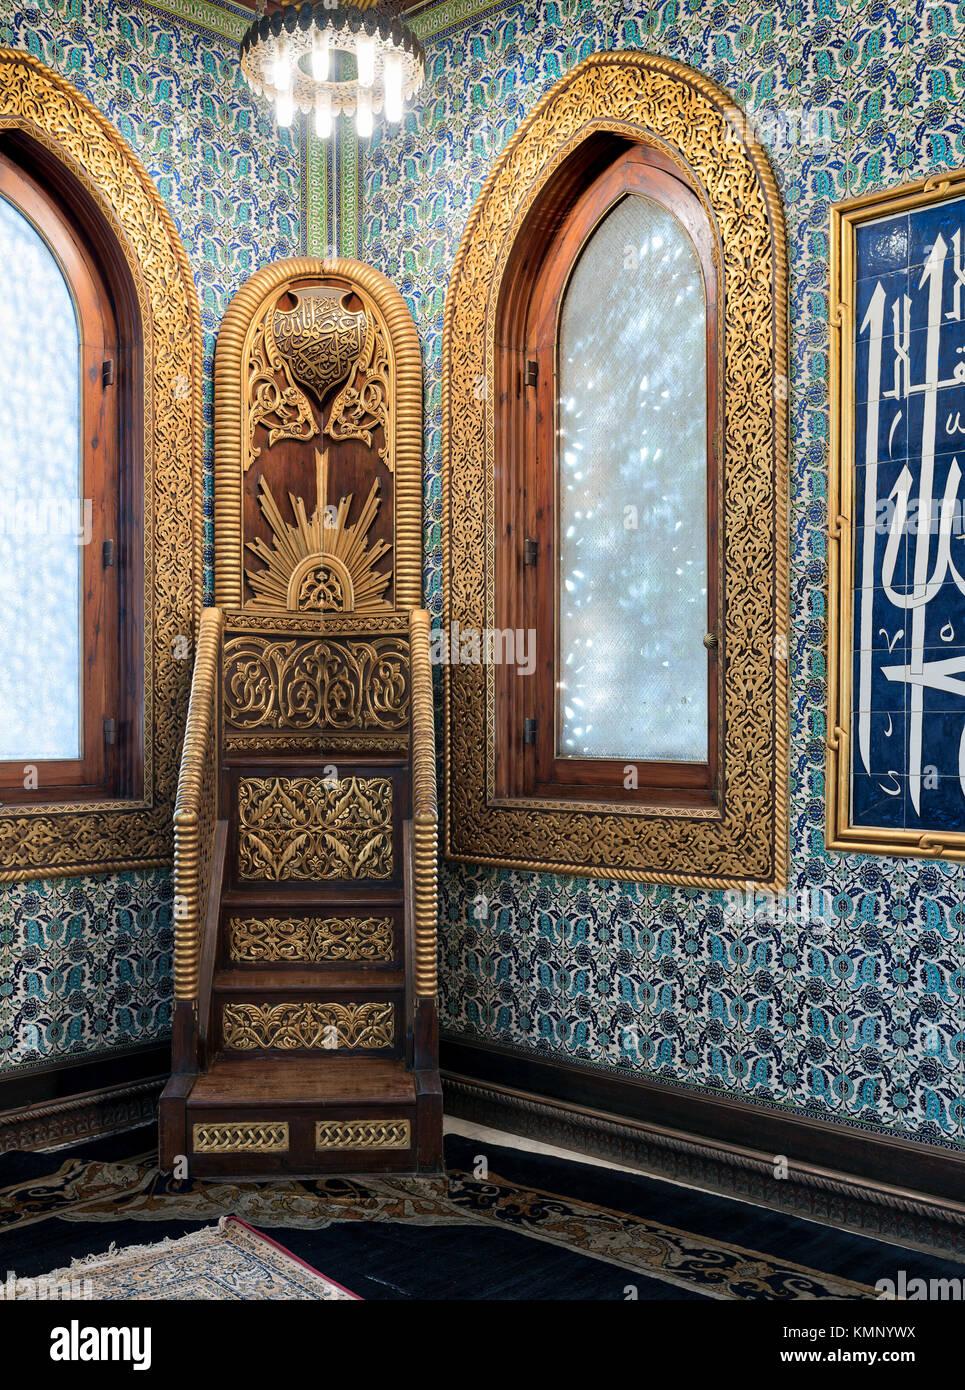 Golden ornate minbar, wooden arched window framed by golden ornate floral pattern, and floral blue pattern ceramic - Stock Image